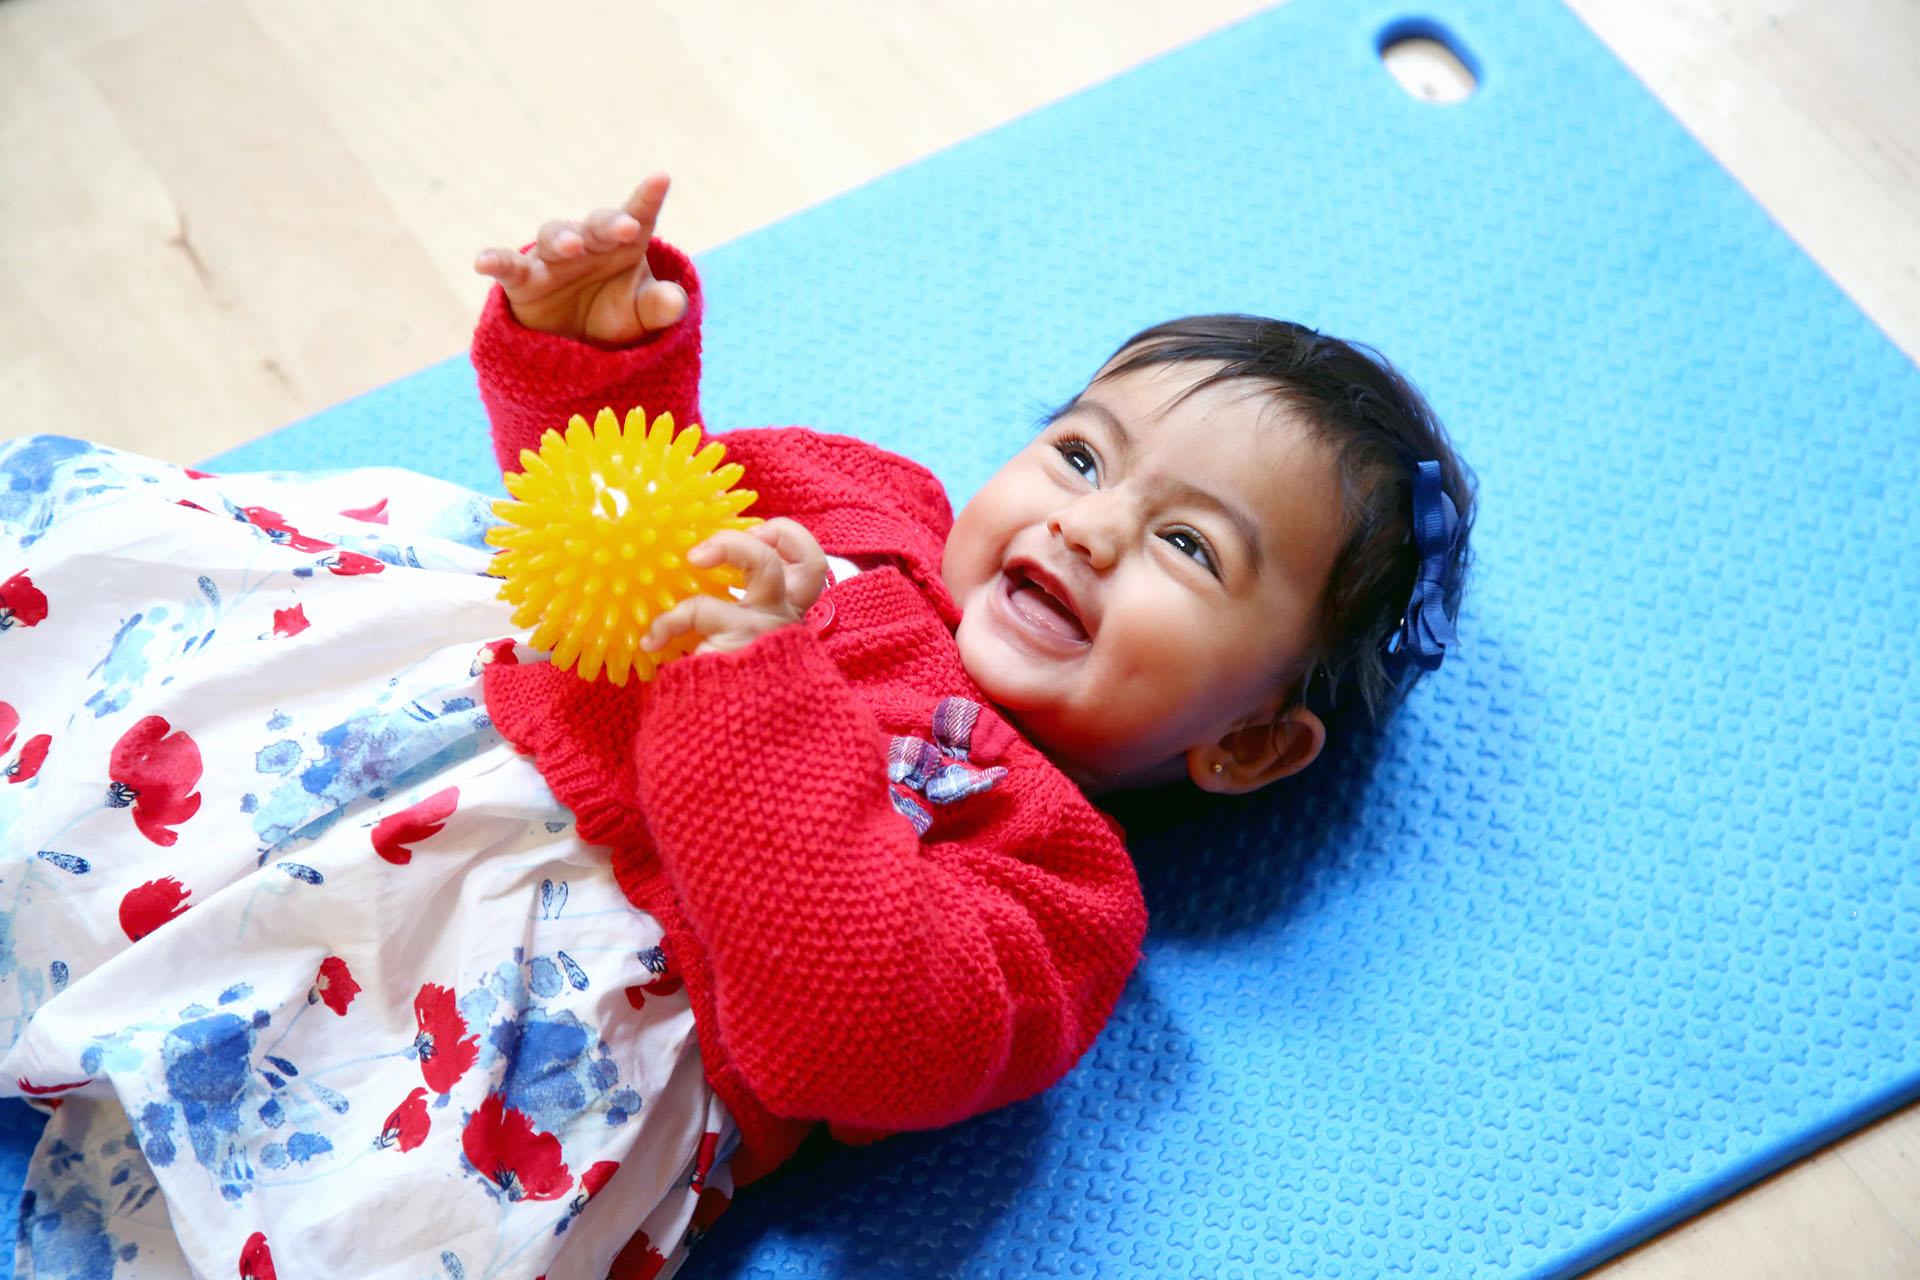 BabyCollege Swansea, Neath, Llanelli's main image